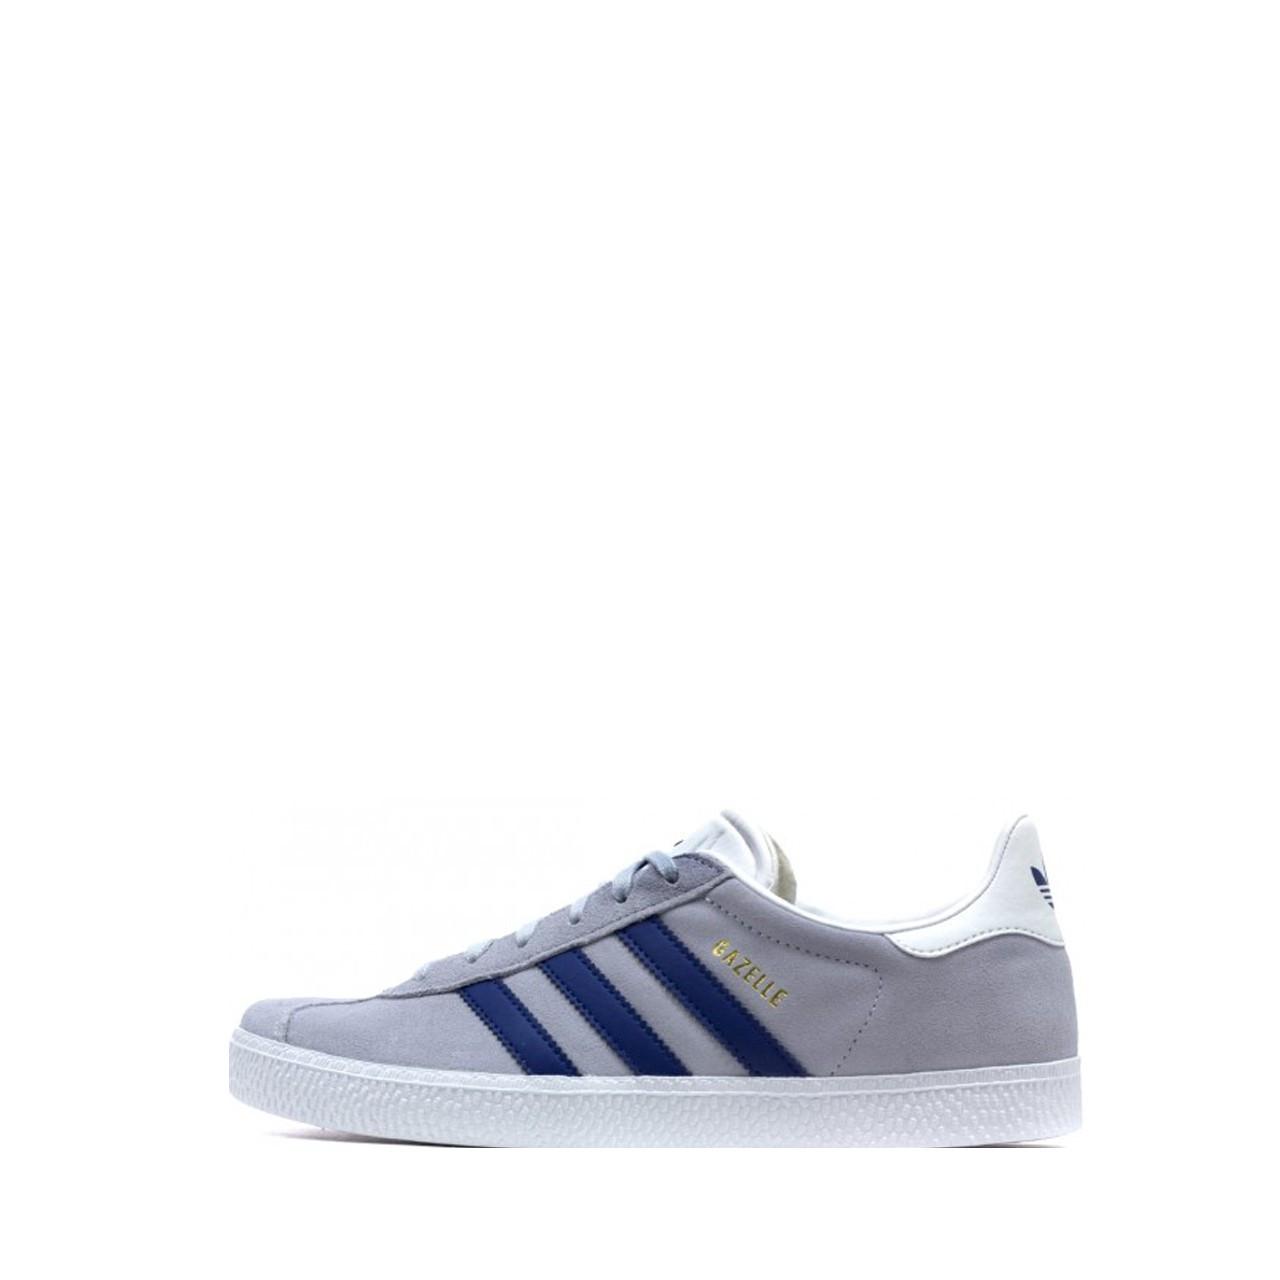 Baskets adidas Originals Gazelle 2 Junior B41518